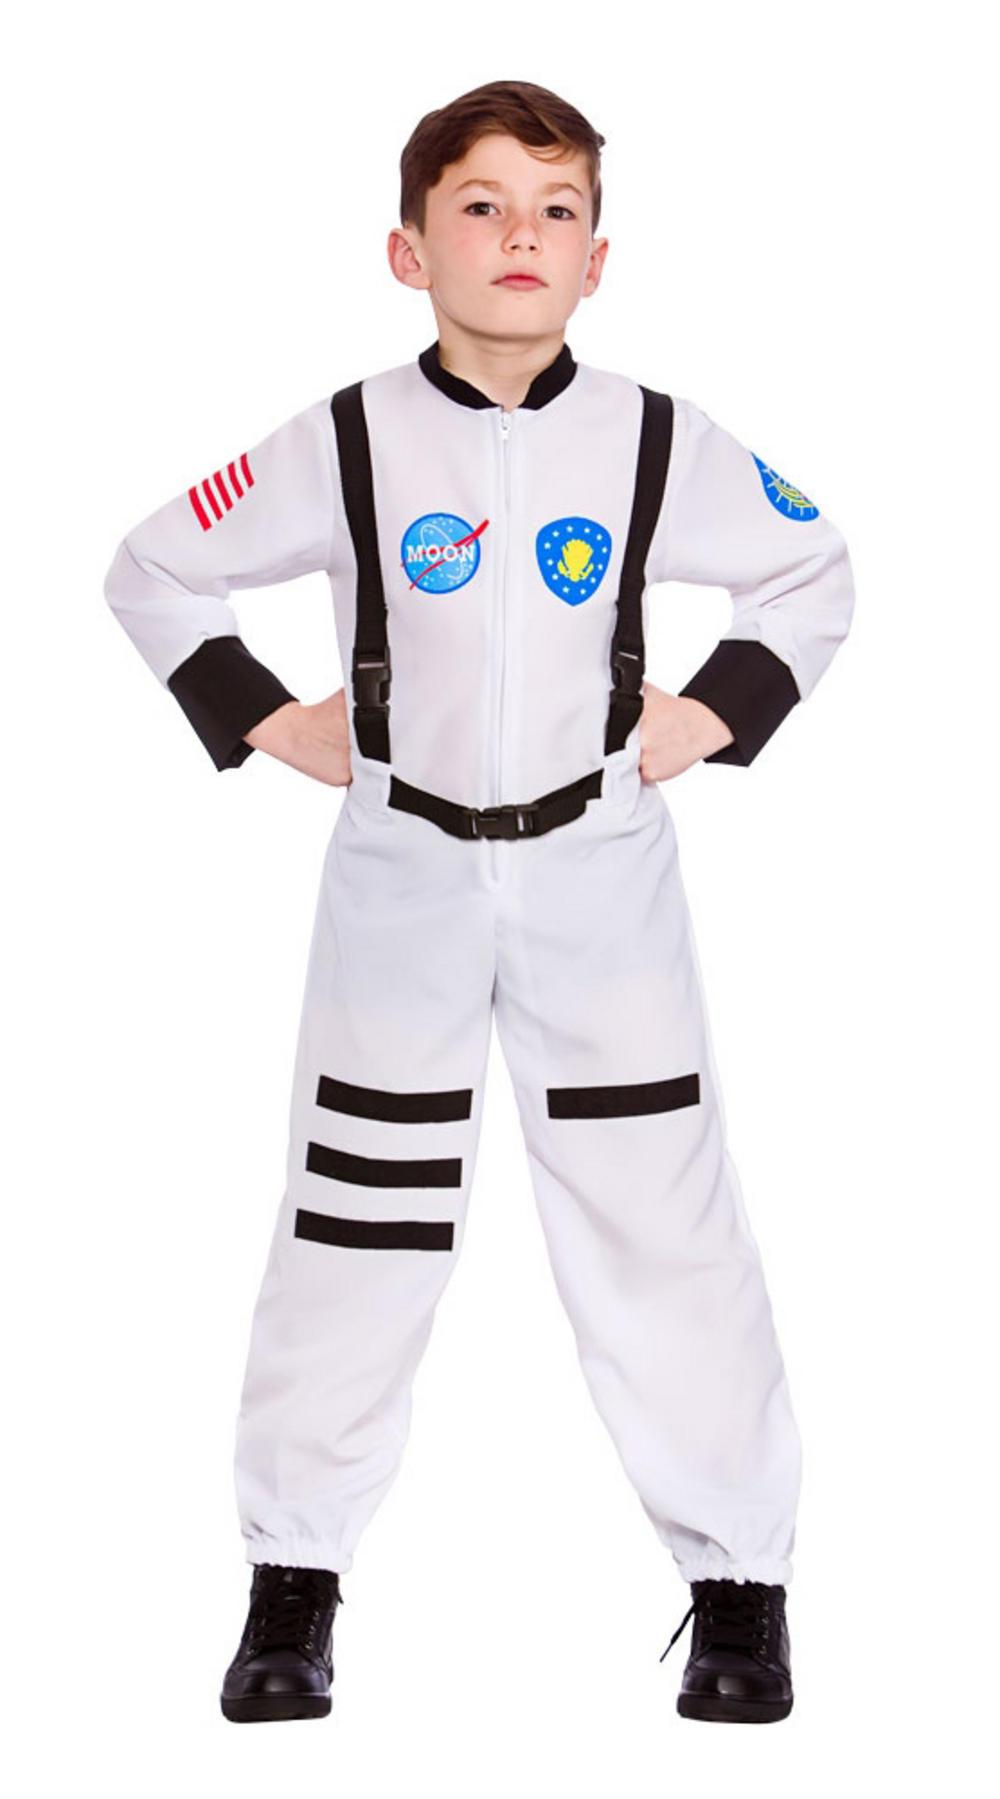 Moon Mission Astronaut Costume